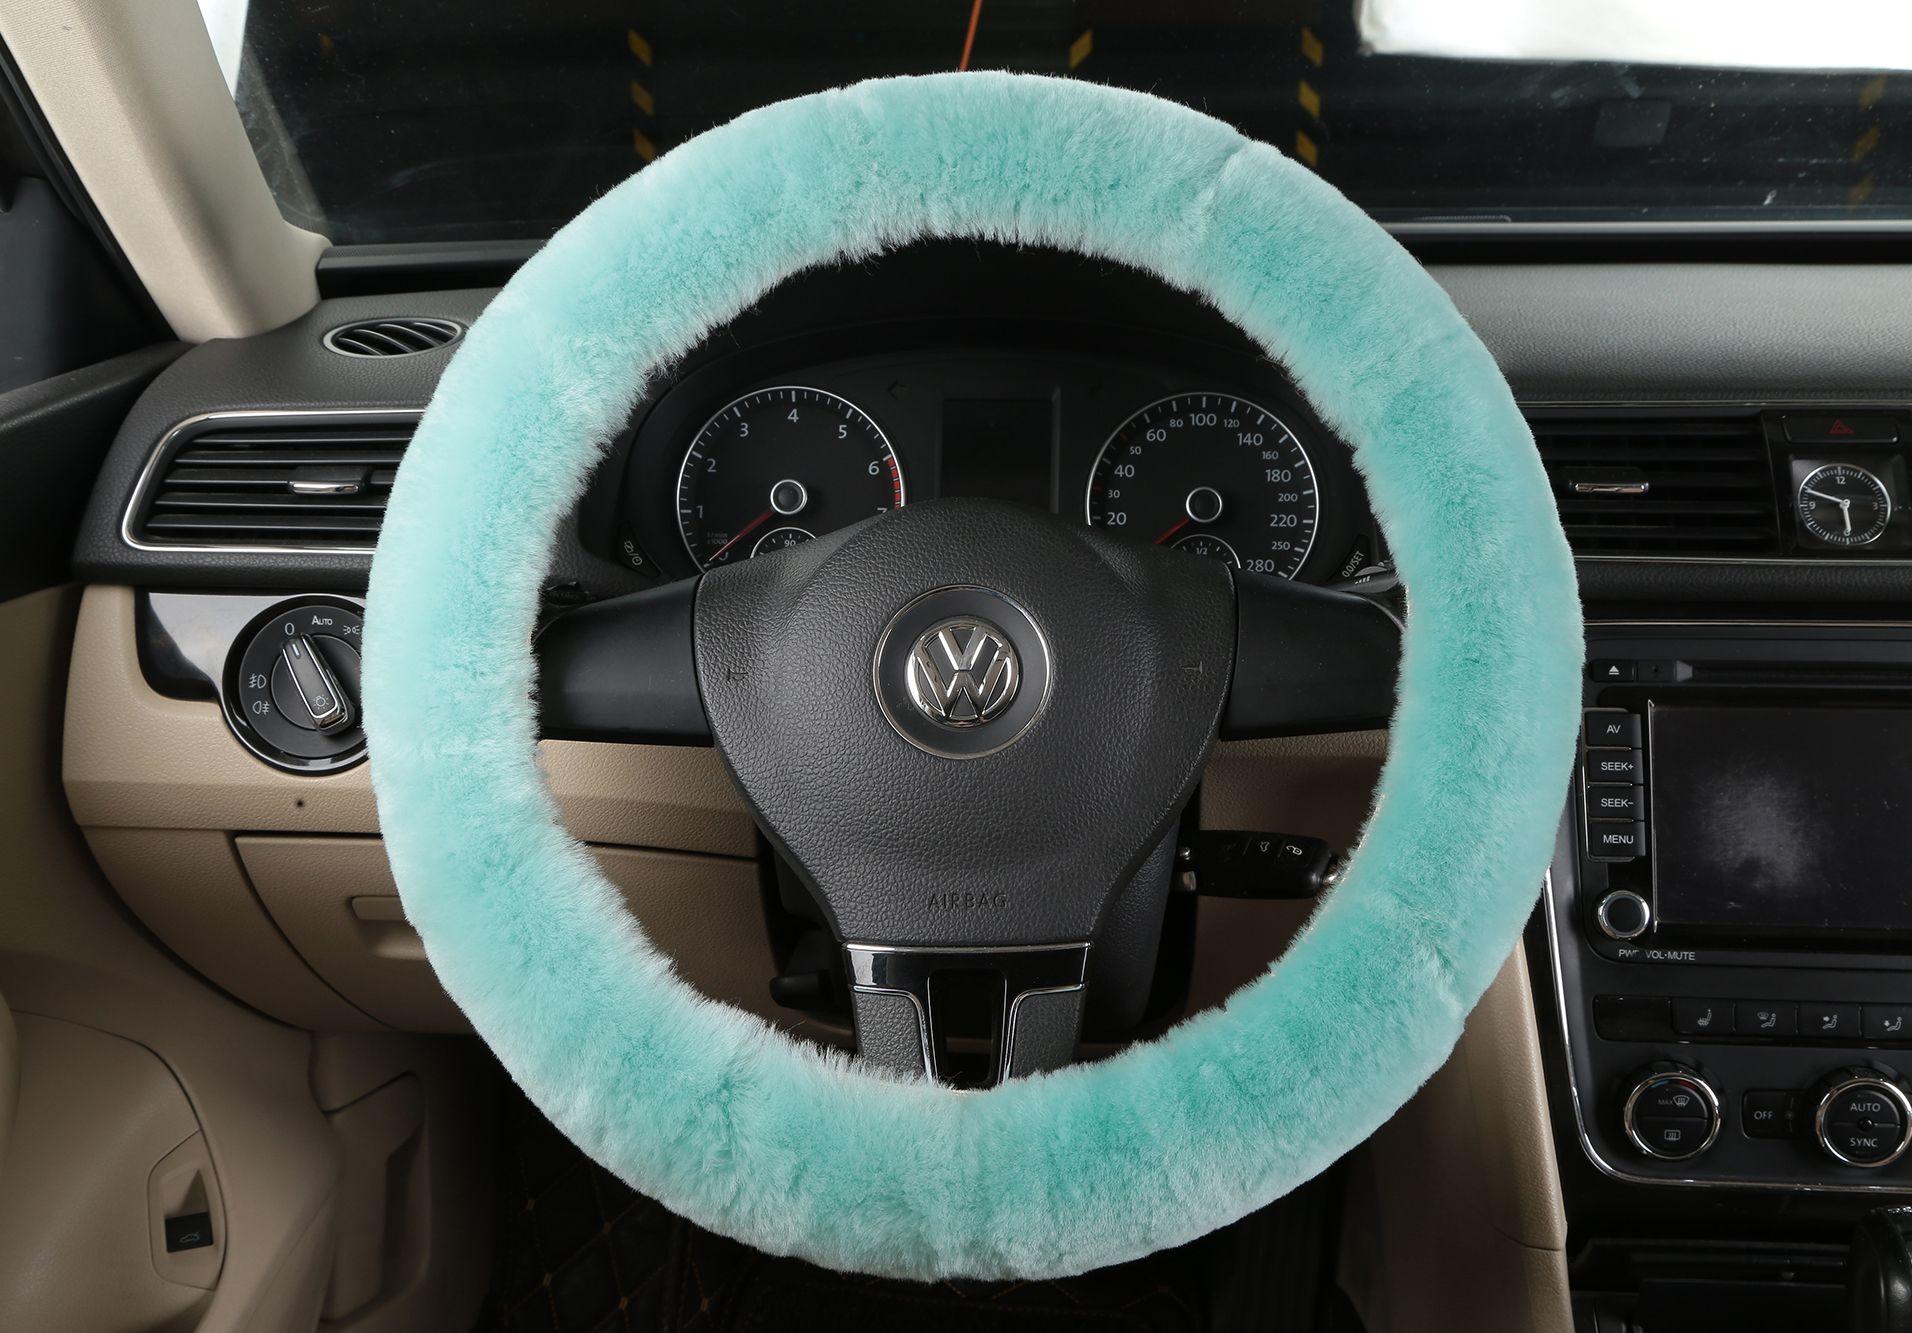 2016 winter steering wheel cover for bmw e90 320 318i 320i 325i 330i 320d x1 car special black purple orange genuine wool car covers peterbilt steering